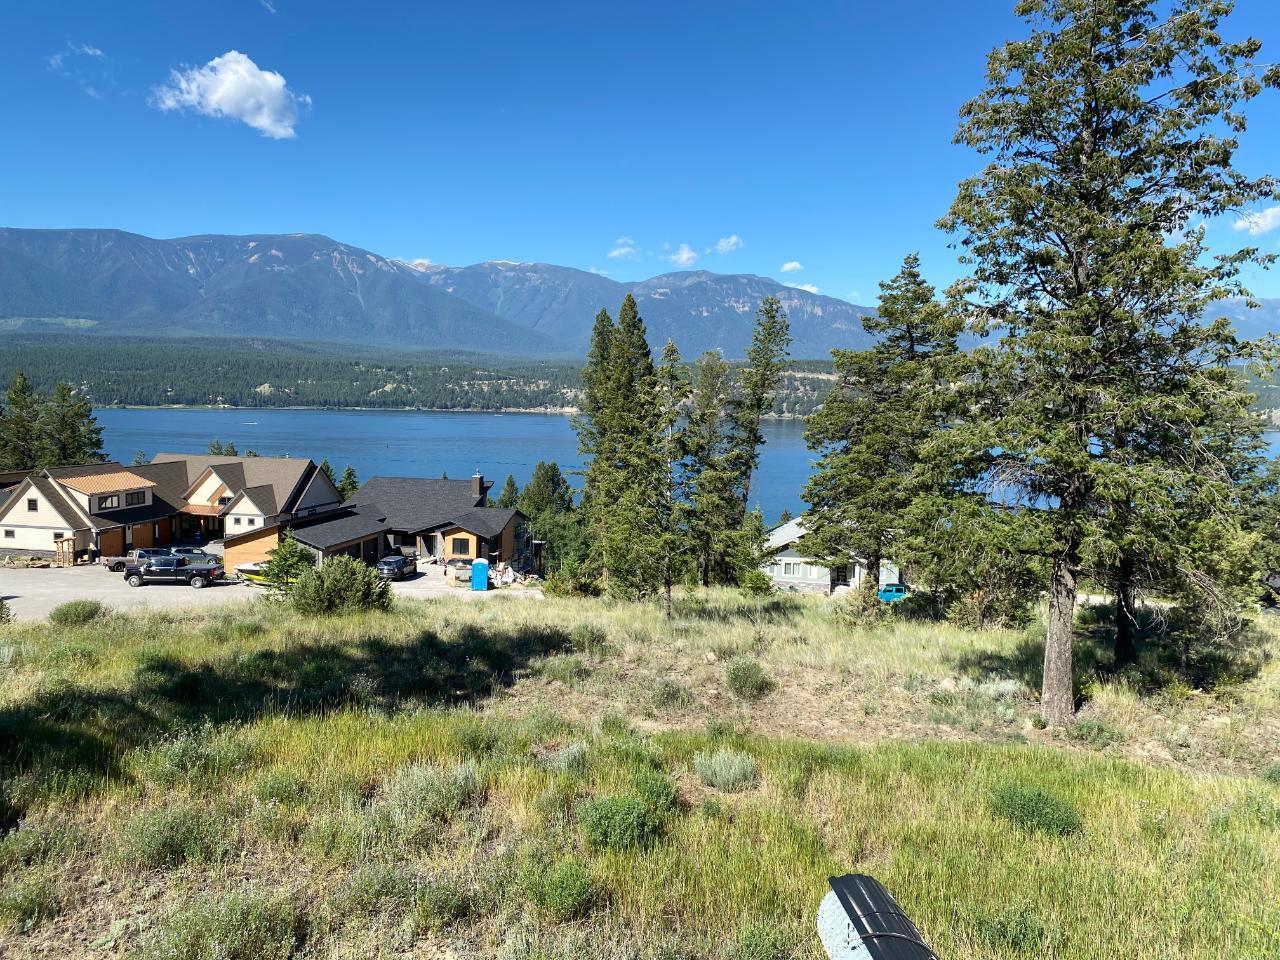 Lot 3 Stoddart Estates Drive, Windermere, British Columbia  V0B 2L0 - Photo 1 - 2451194